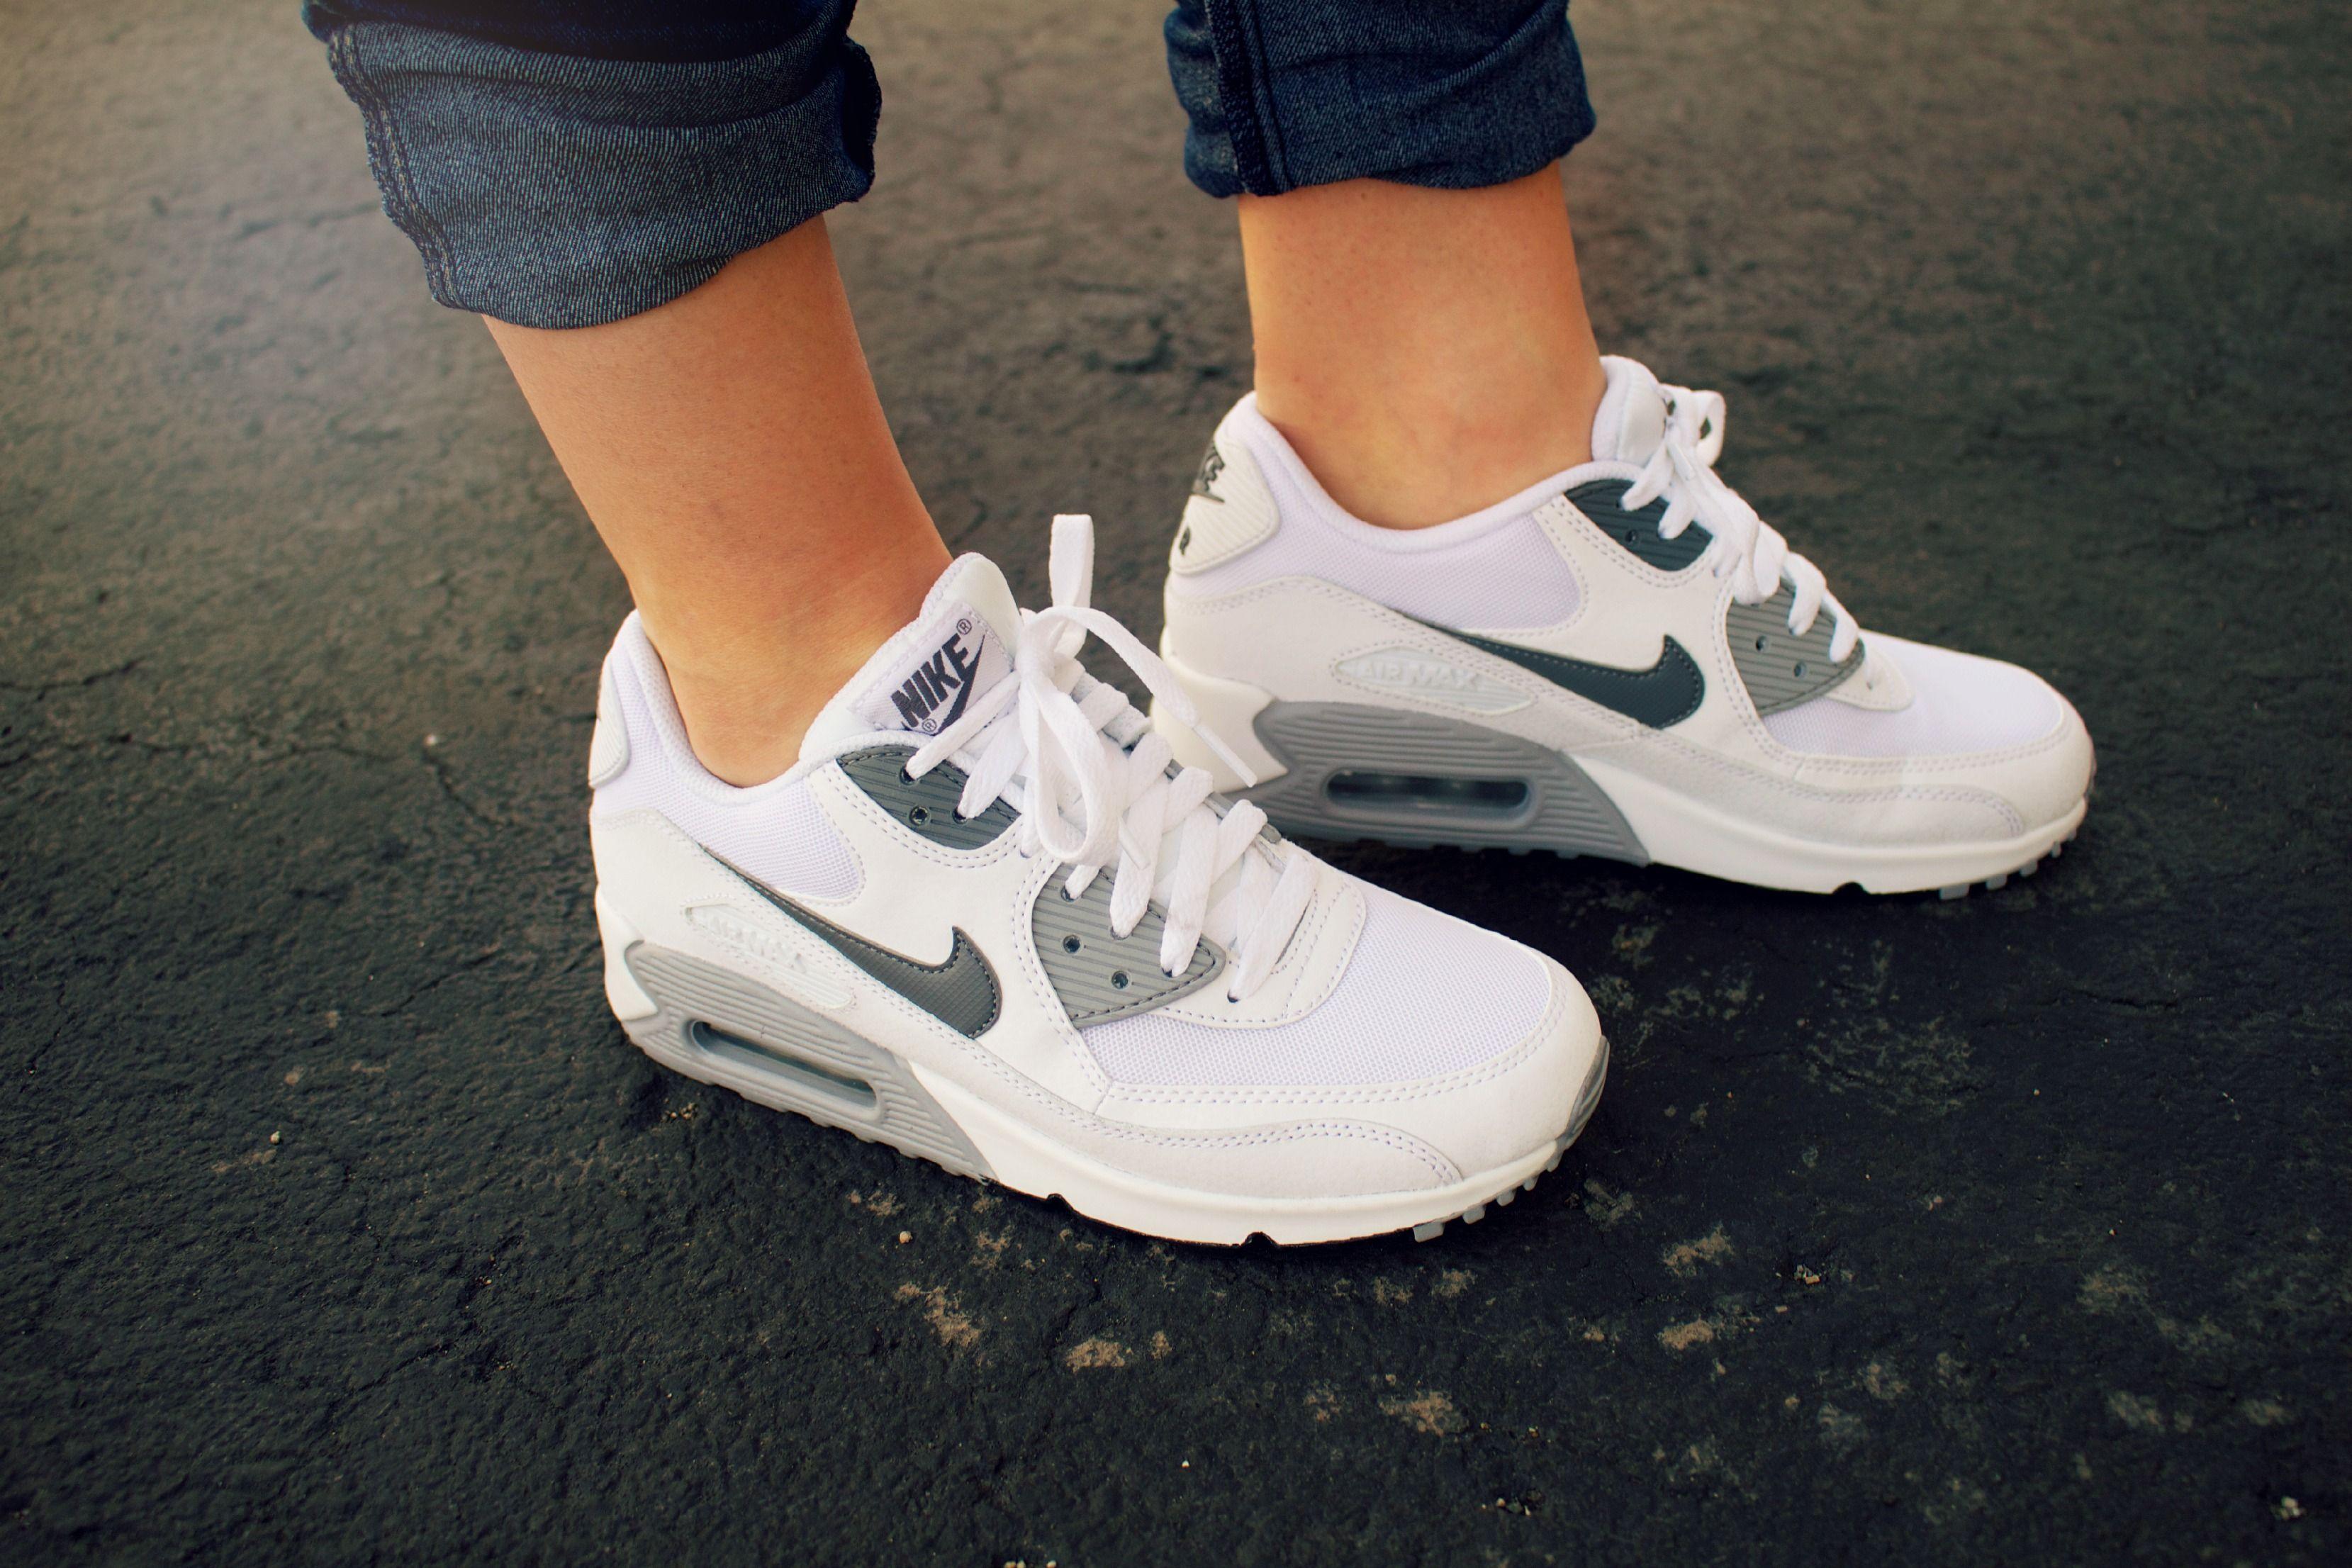 Amelia on in 2019 Air MaxNike joggesko kvinner, Nike Air Max Nike running shoes women, Nike